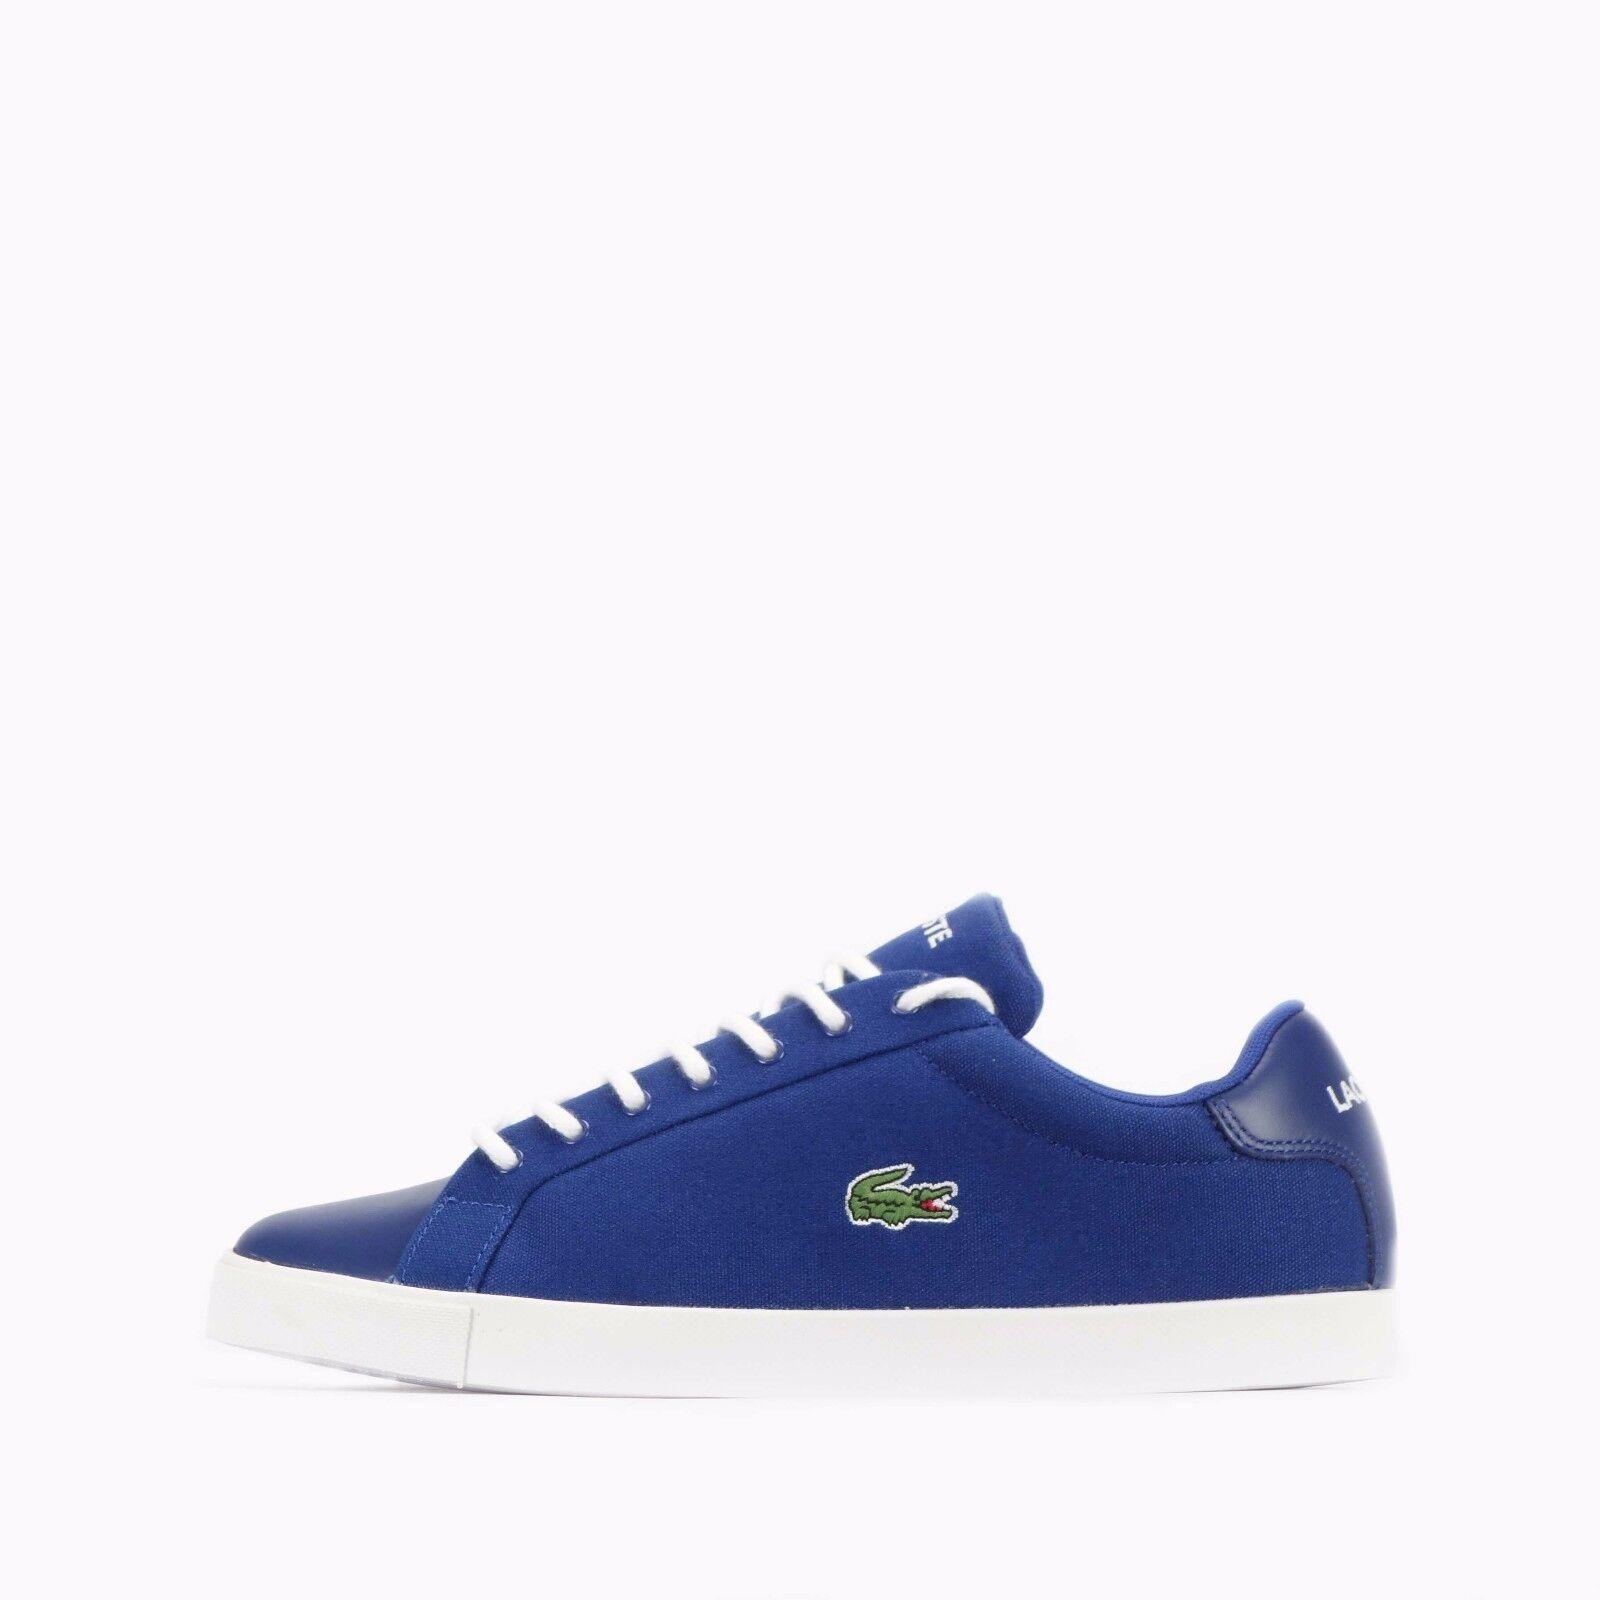 Lacoste Graduate Pique Mens shoes in bluee White